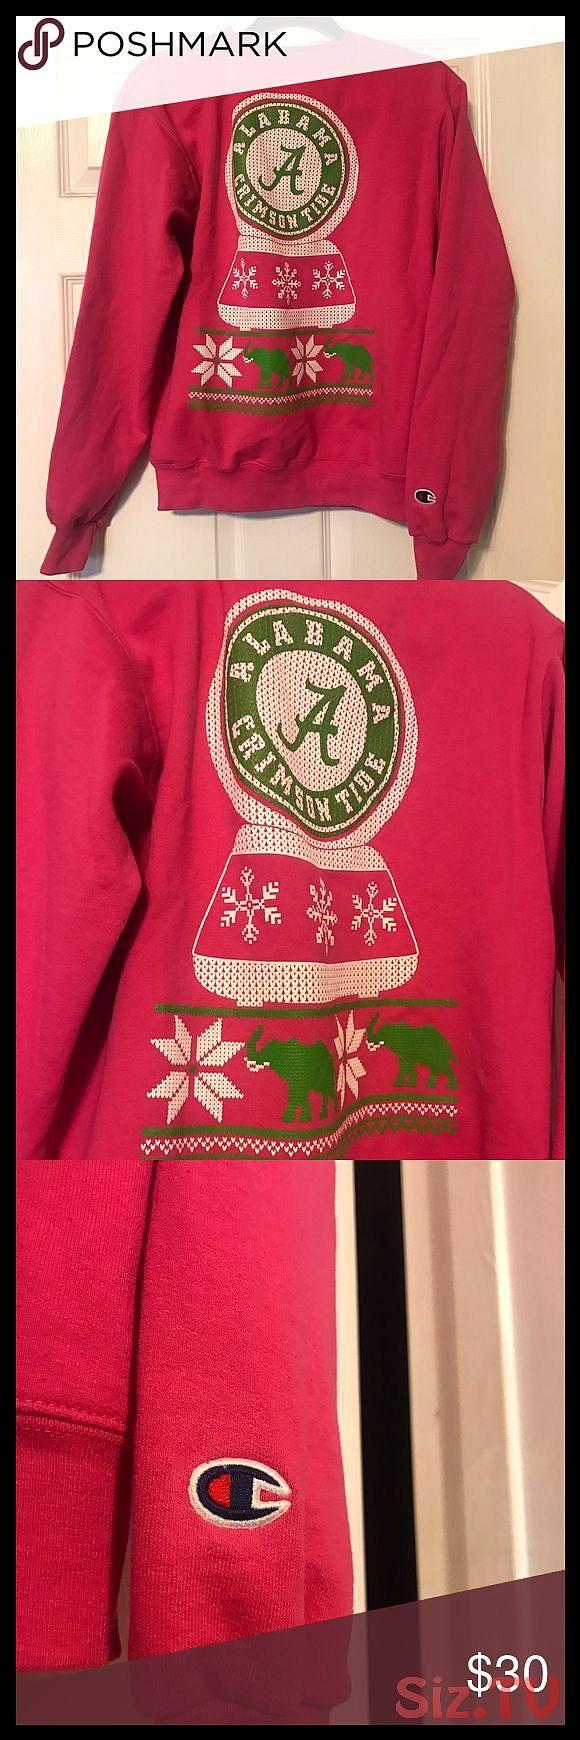 Alabama Crimson Tide Champion Sweatshirt Alabama Crimson Tide Champion Sweatshirt Colors Are Hot Pink Wit Champion Sweatshirt Sweatshirts Alabama Crimson Tide [ 1740 x 580 Pixel ]